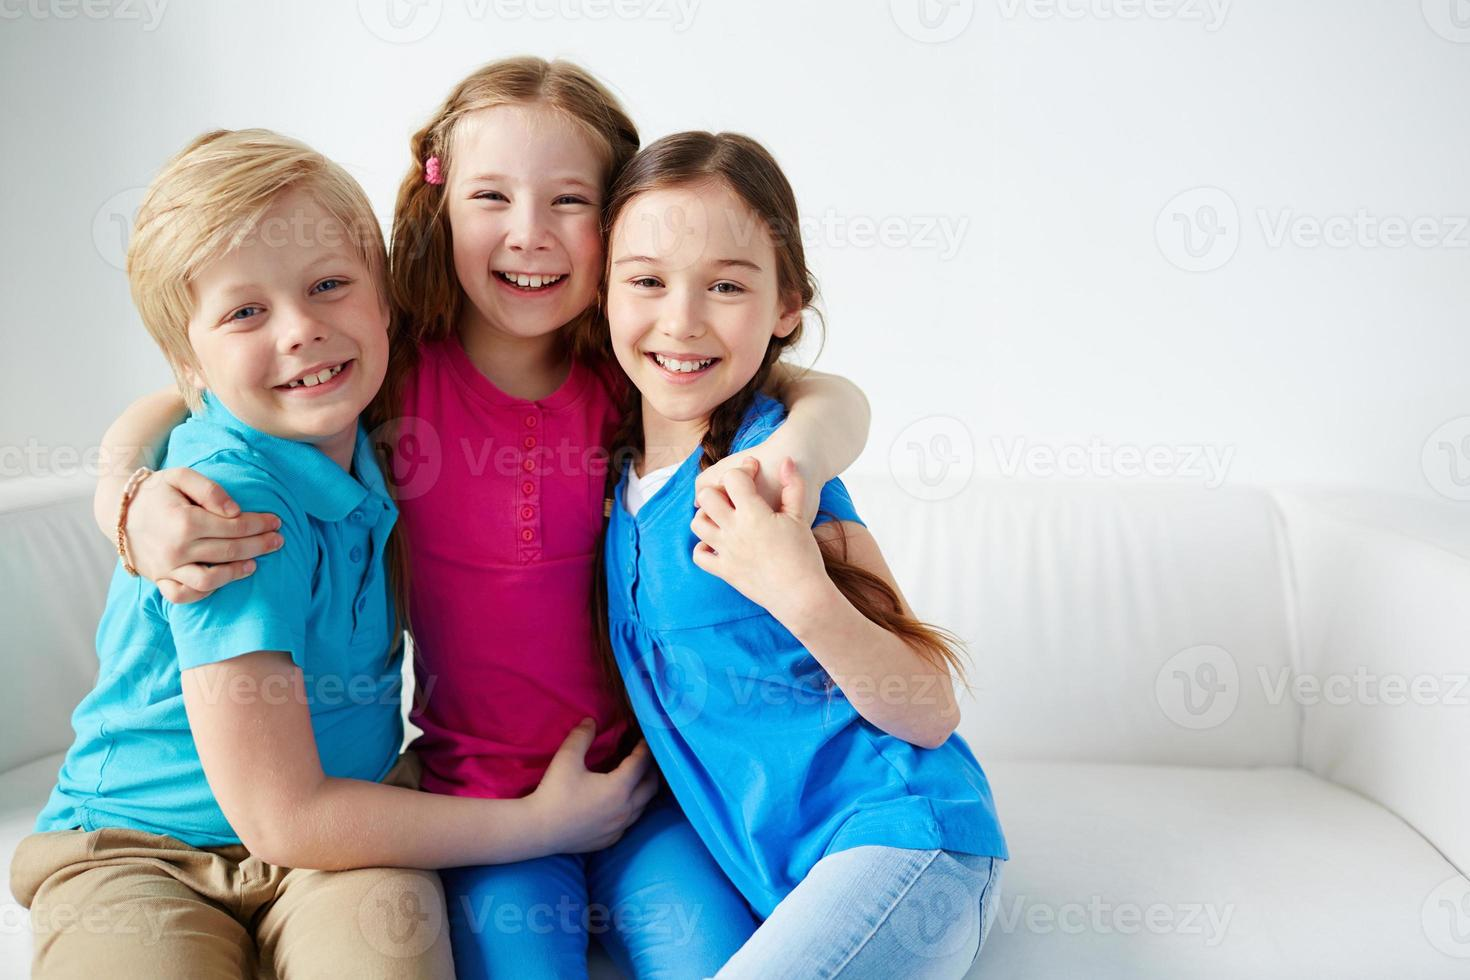 fröhliche Kinder foto